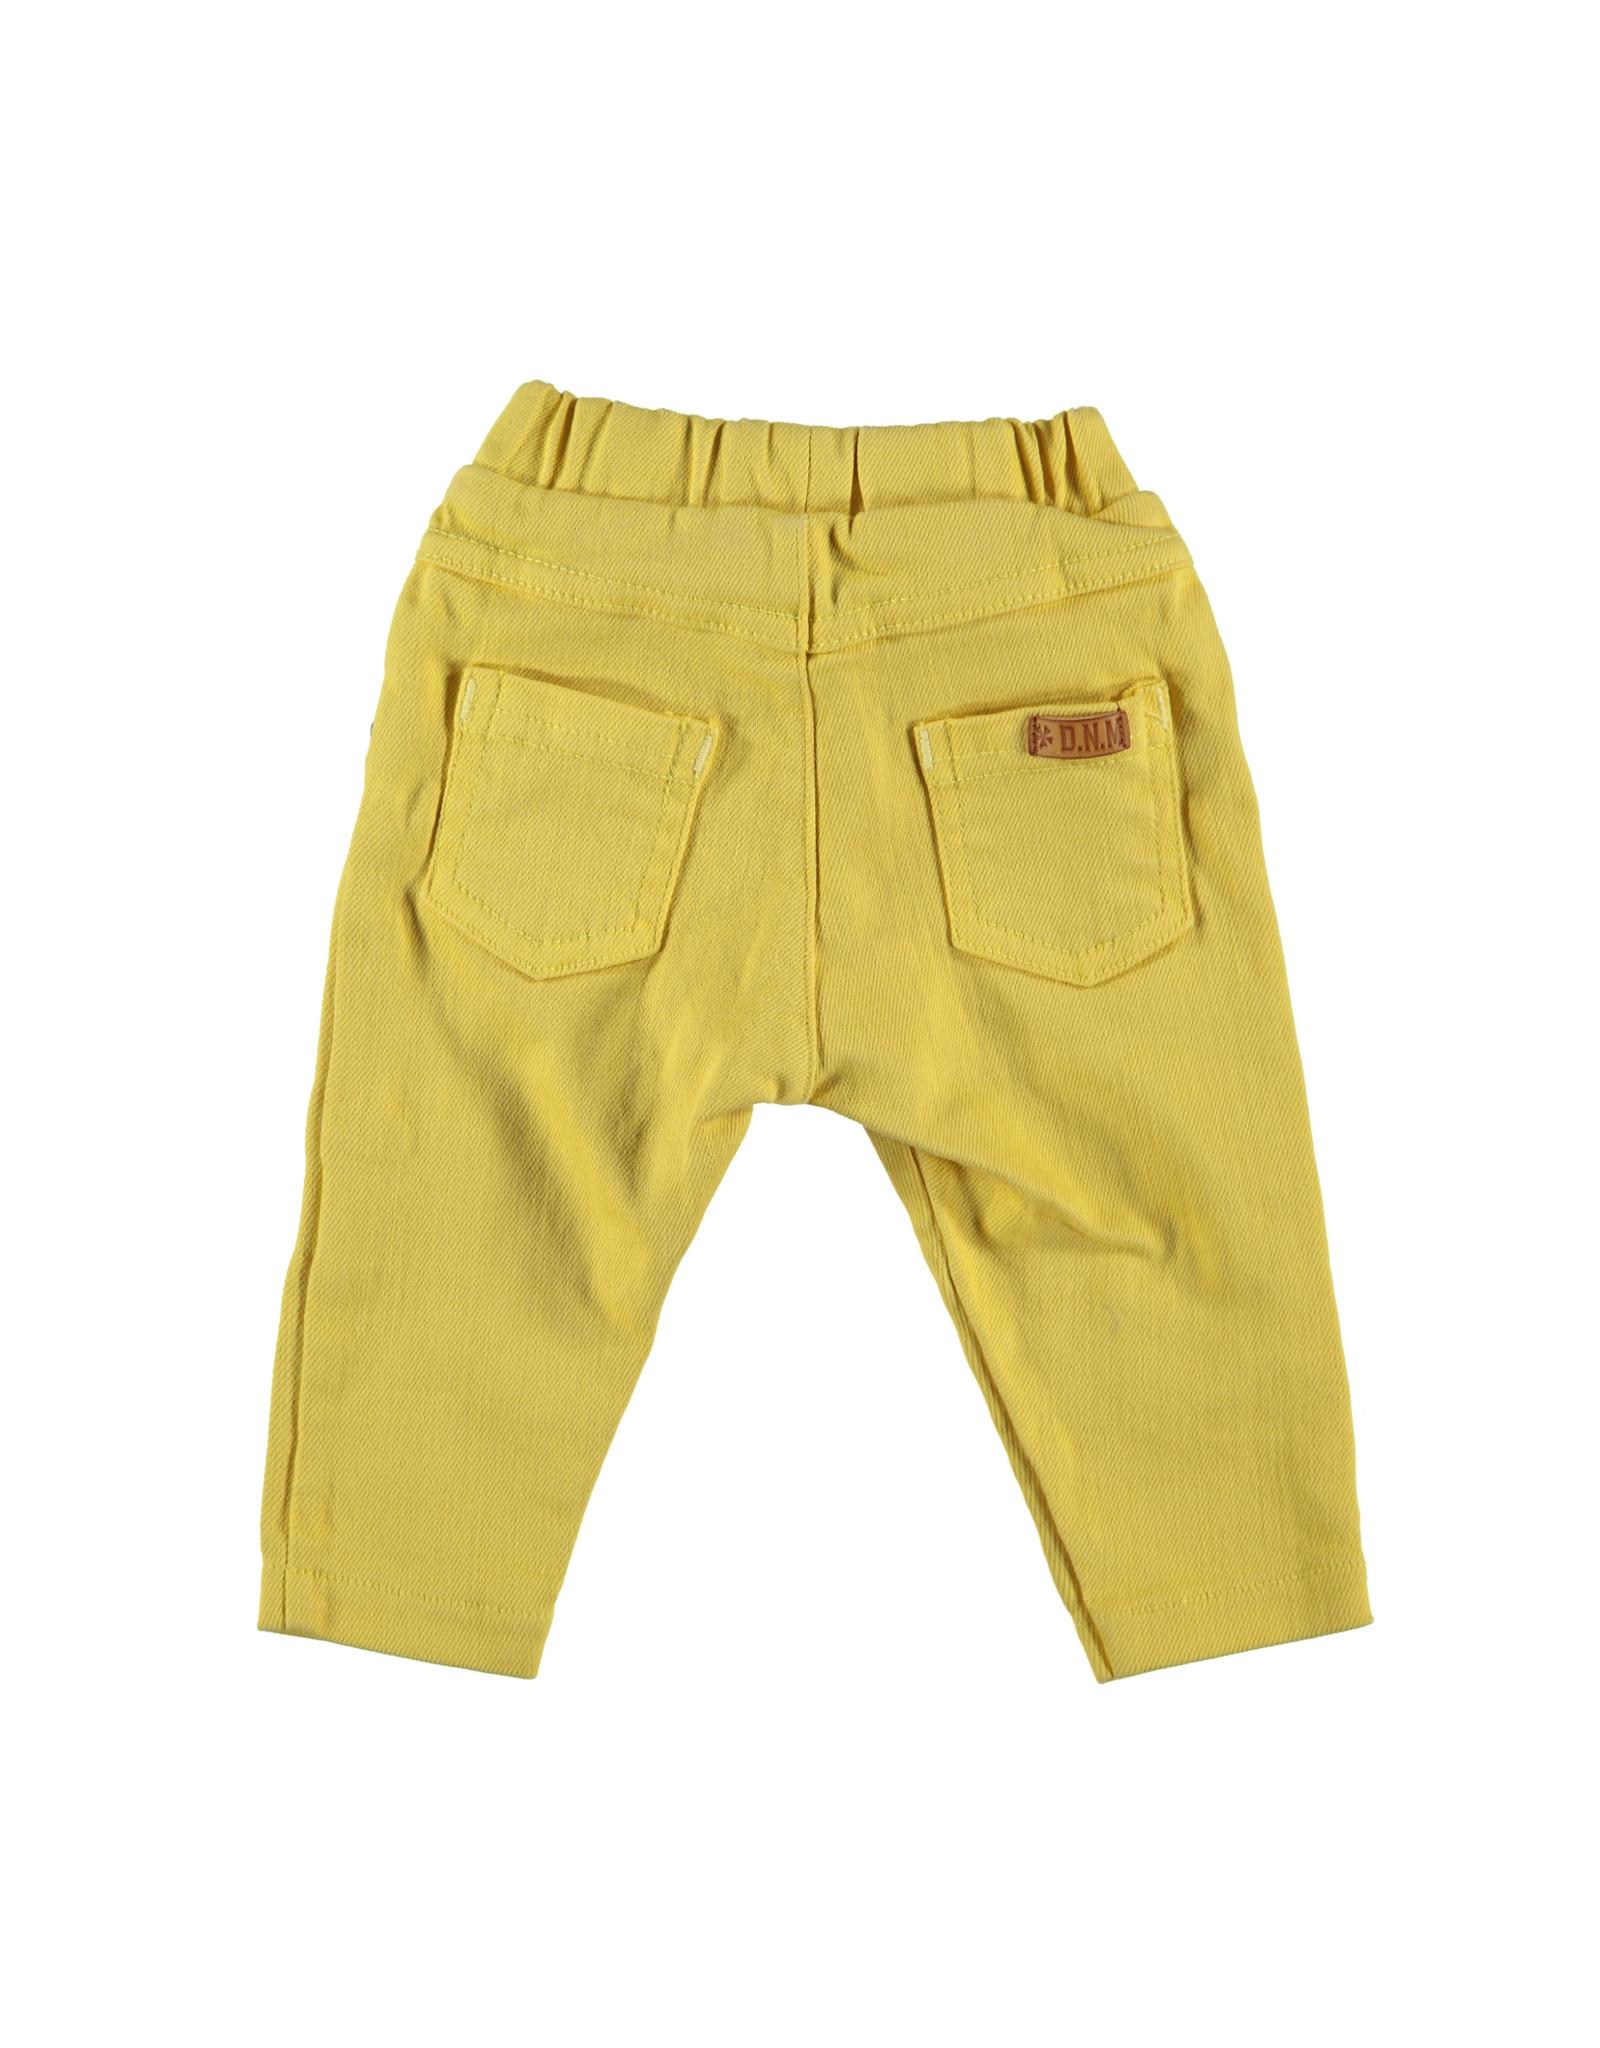 B.E.S.S. Jegging, Yellow